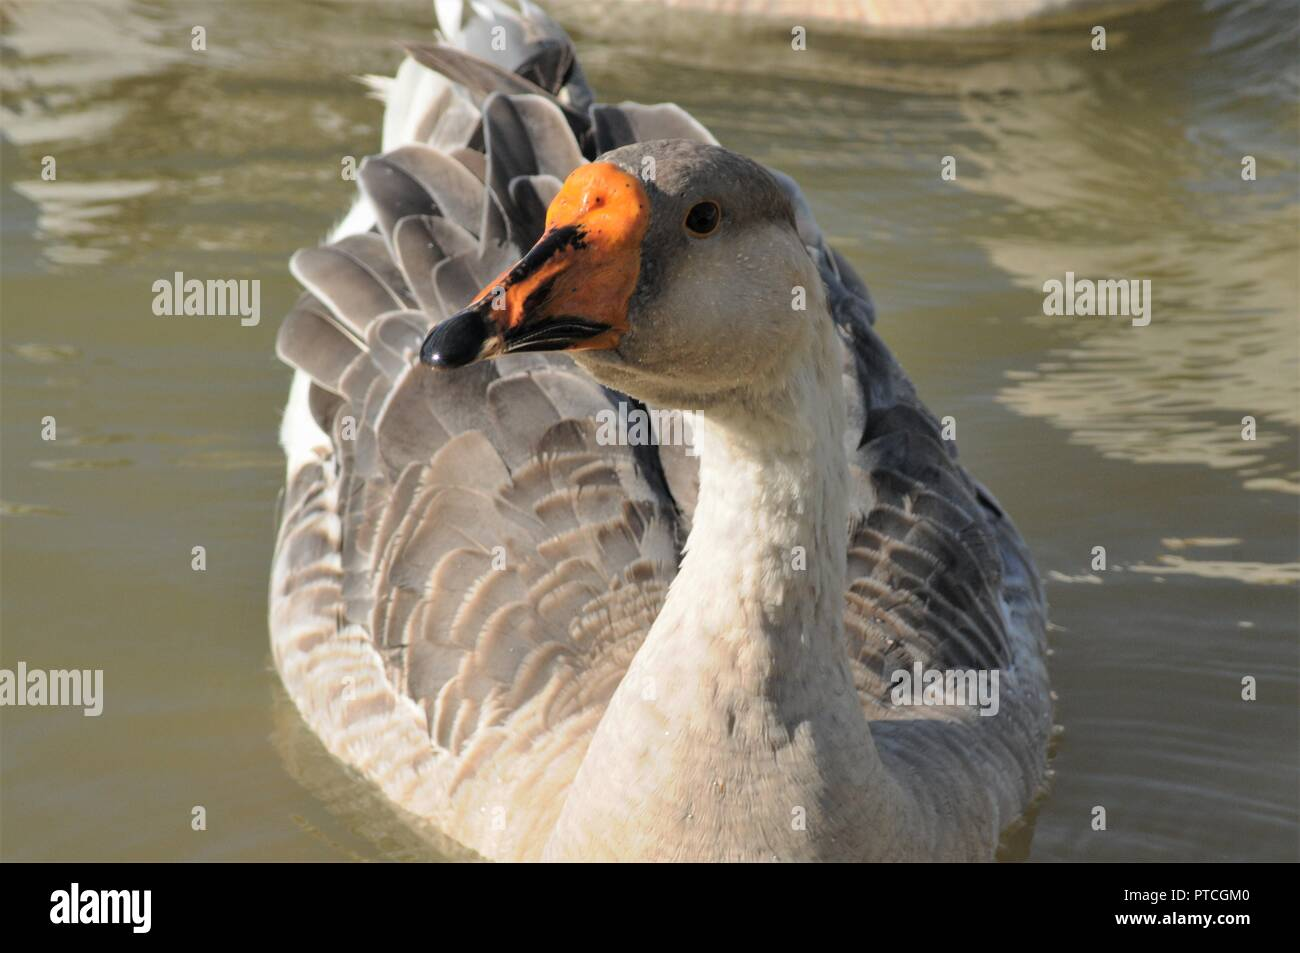 Chinese goose portrait - Stock Image